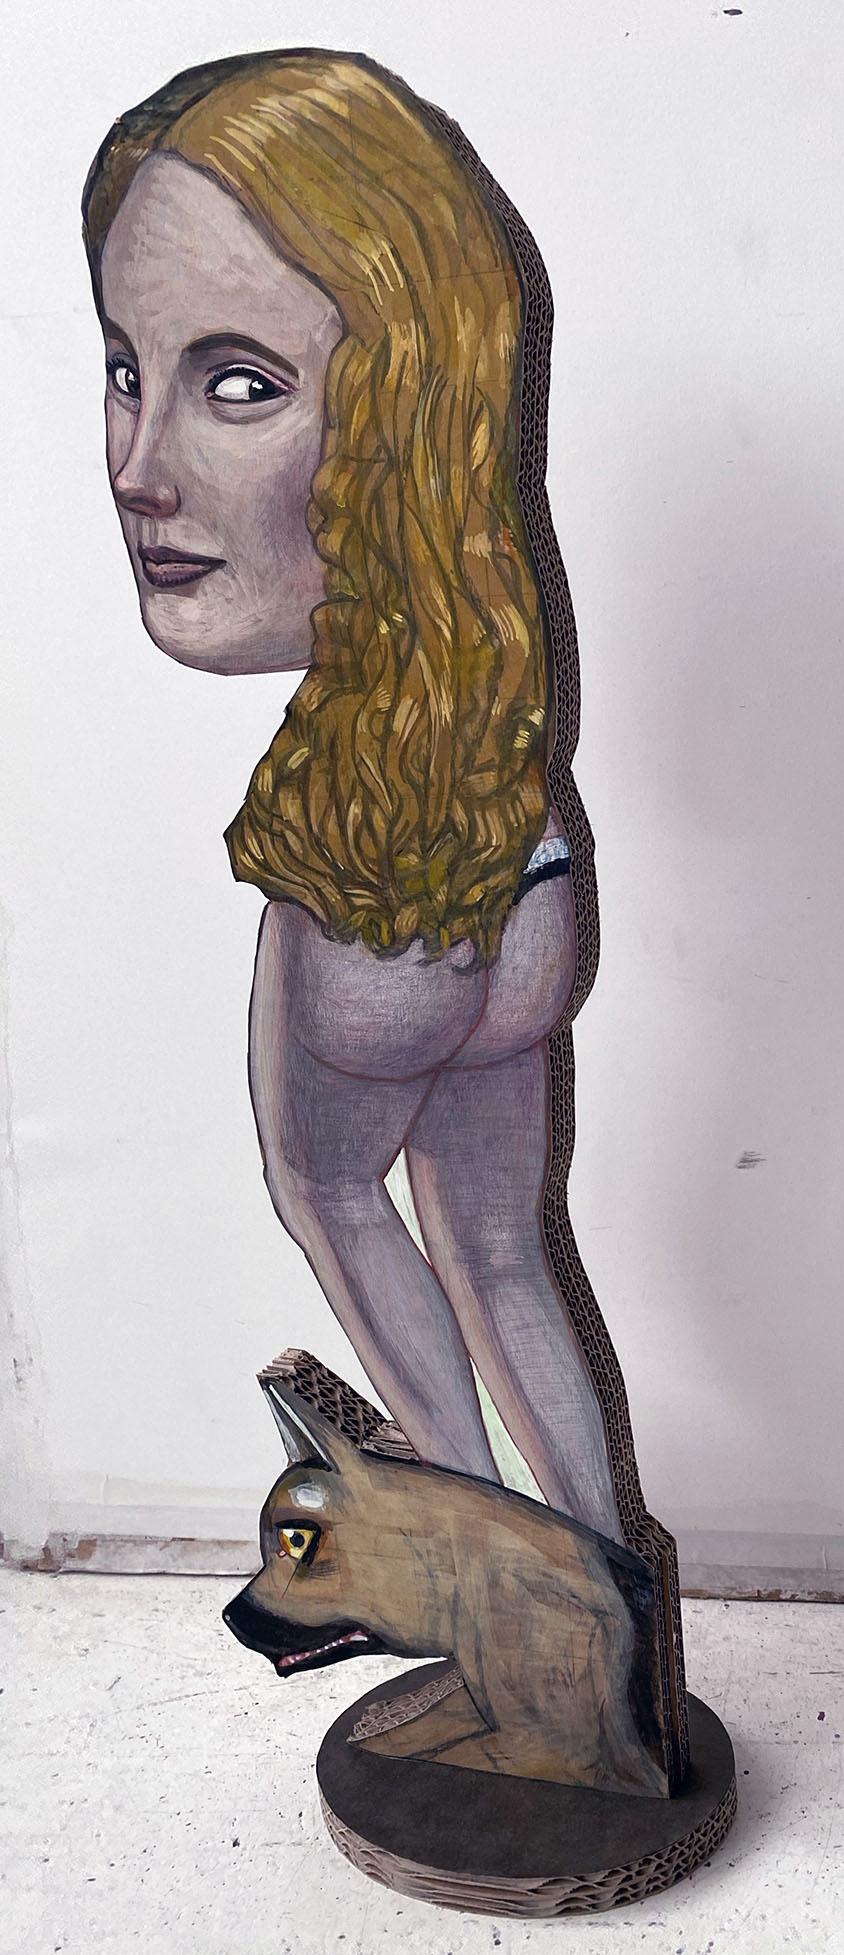 Pat Andrea, Omkijken, mixed media on carton, 78 x 25 x 15 cm, 2020